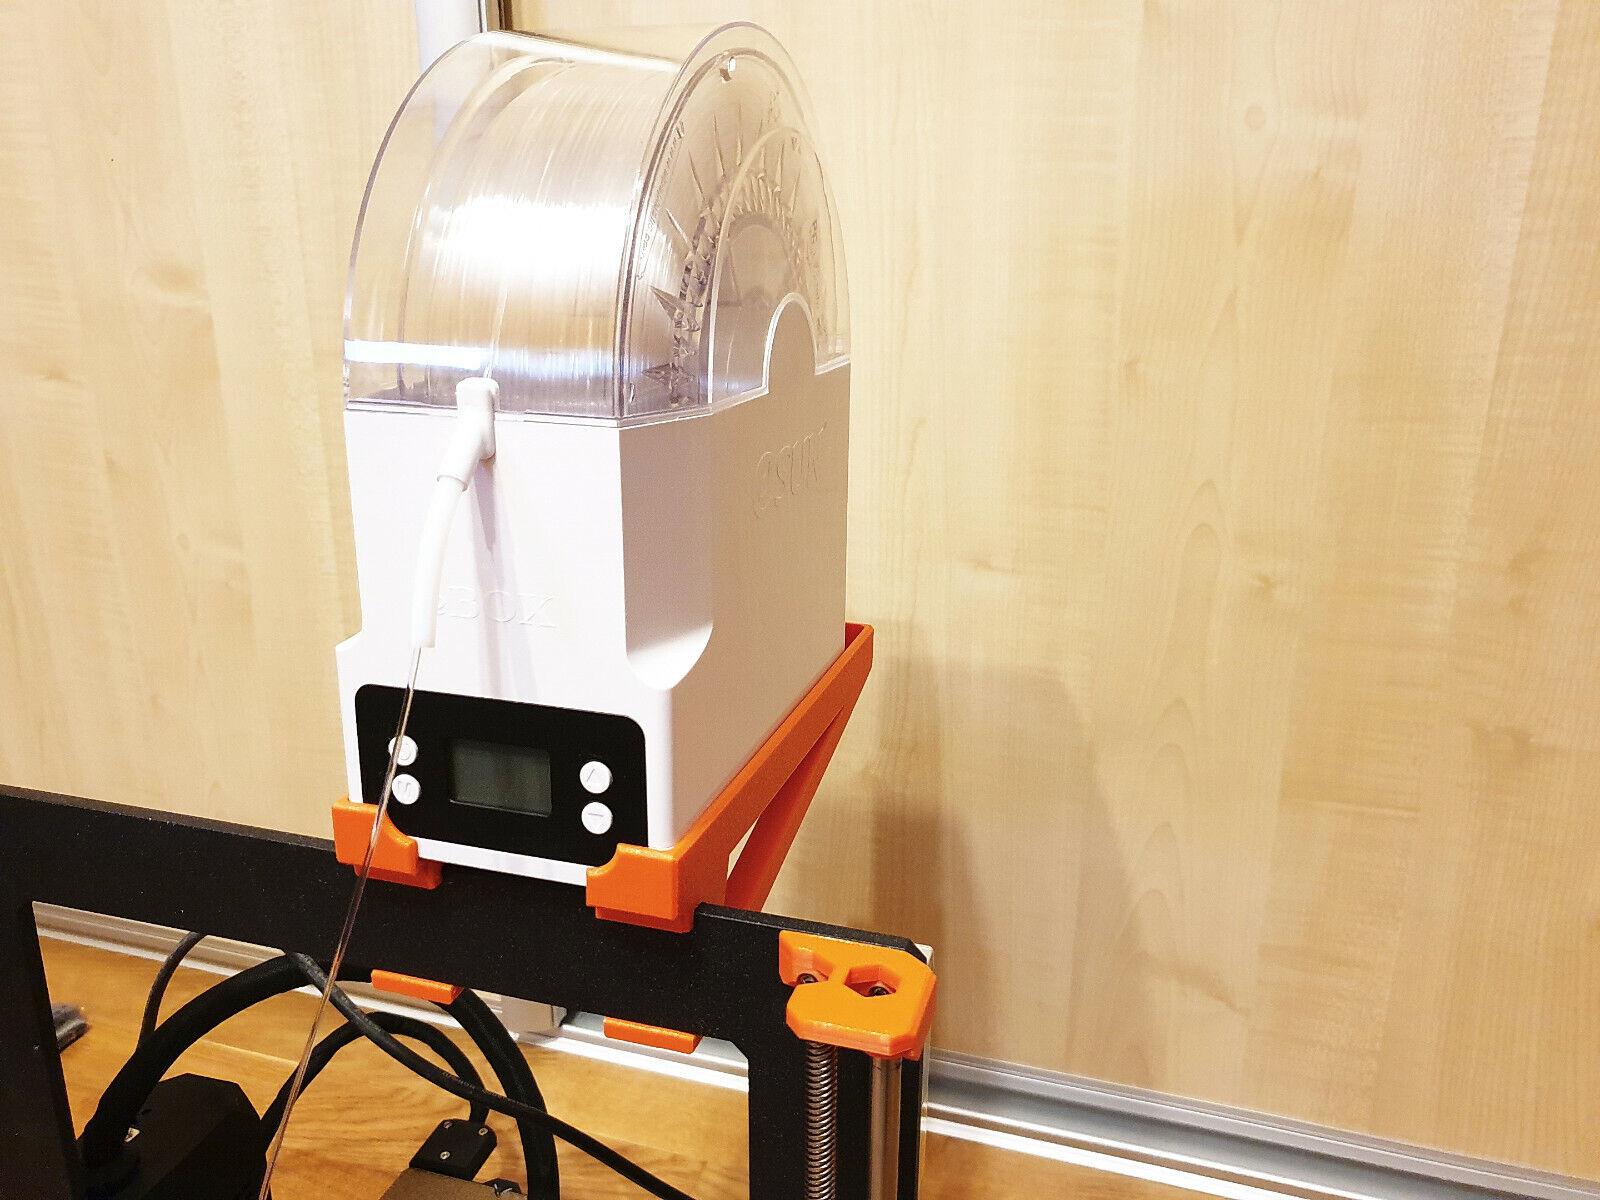 Prusa i3 MK3s filament dryer holder for eSun eBOX